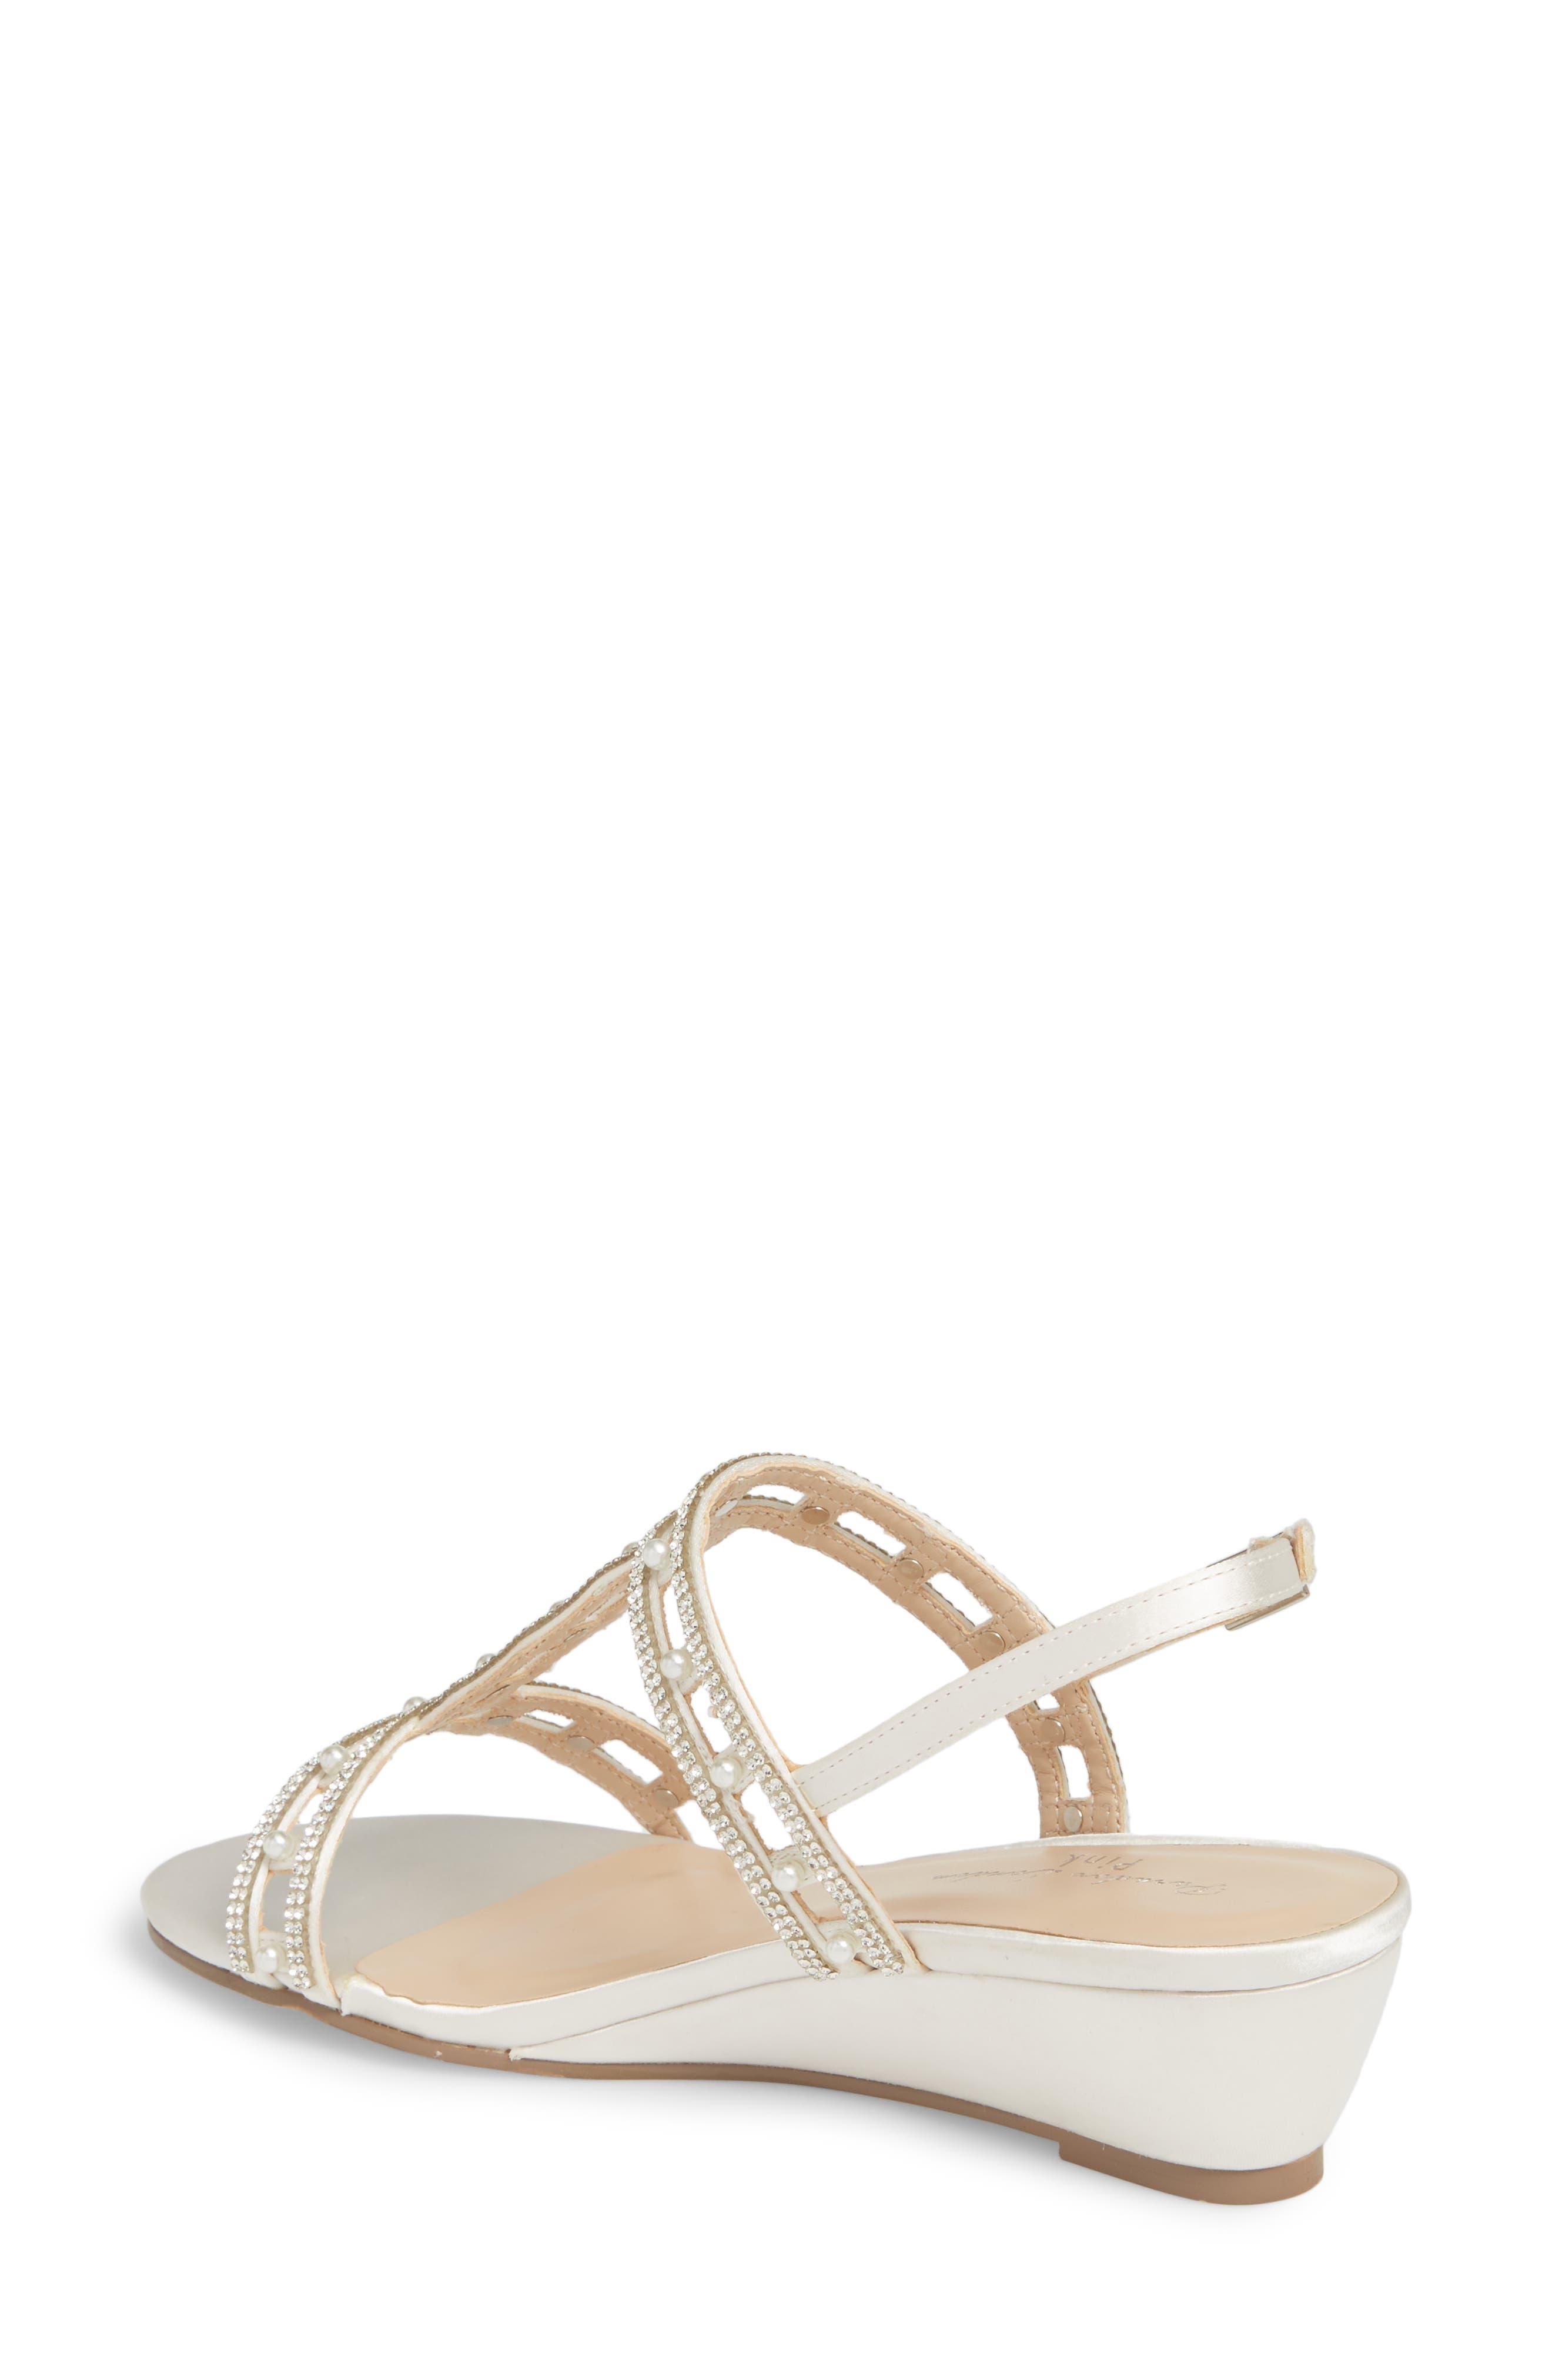 Kamara Embellished Wedge Sandal,                             Alternate thumbnail 2, color,                             Ivory Satin